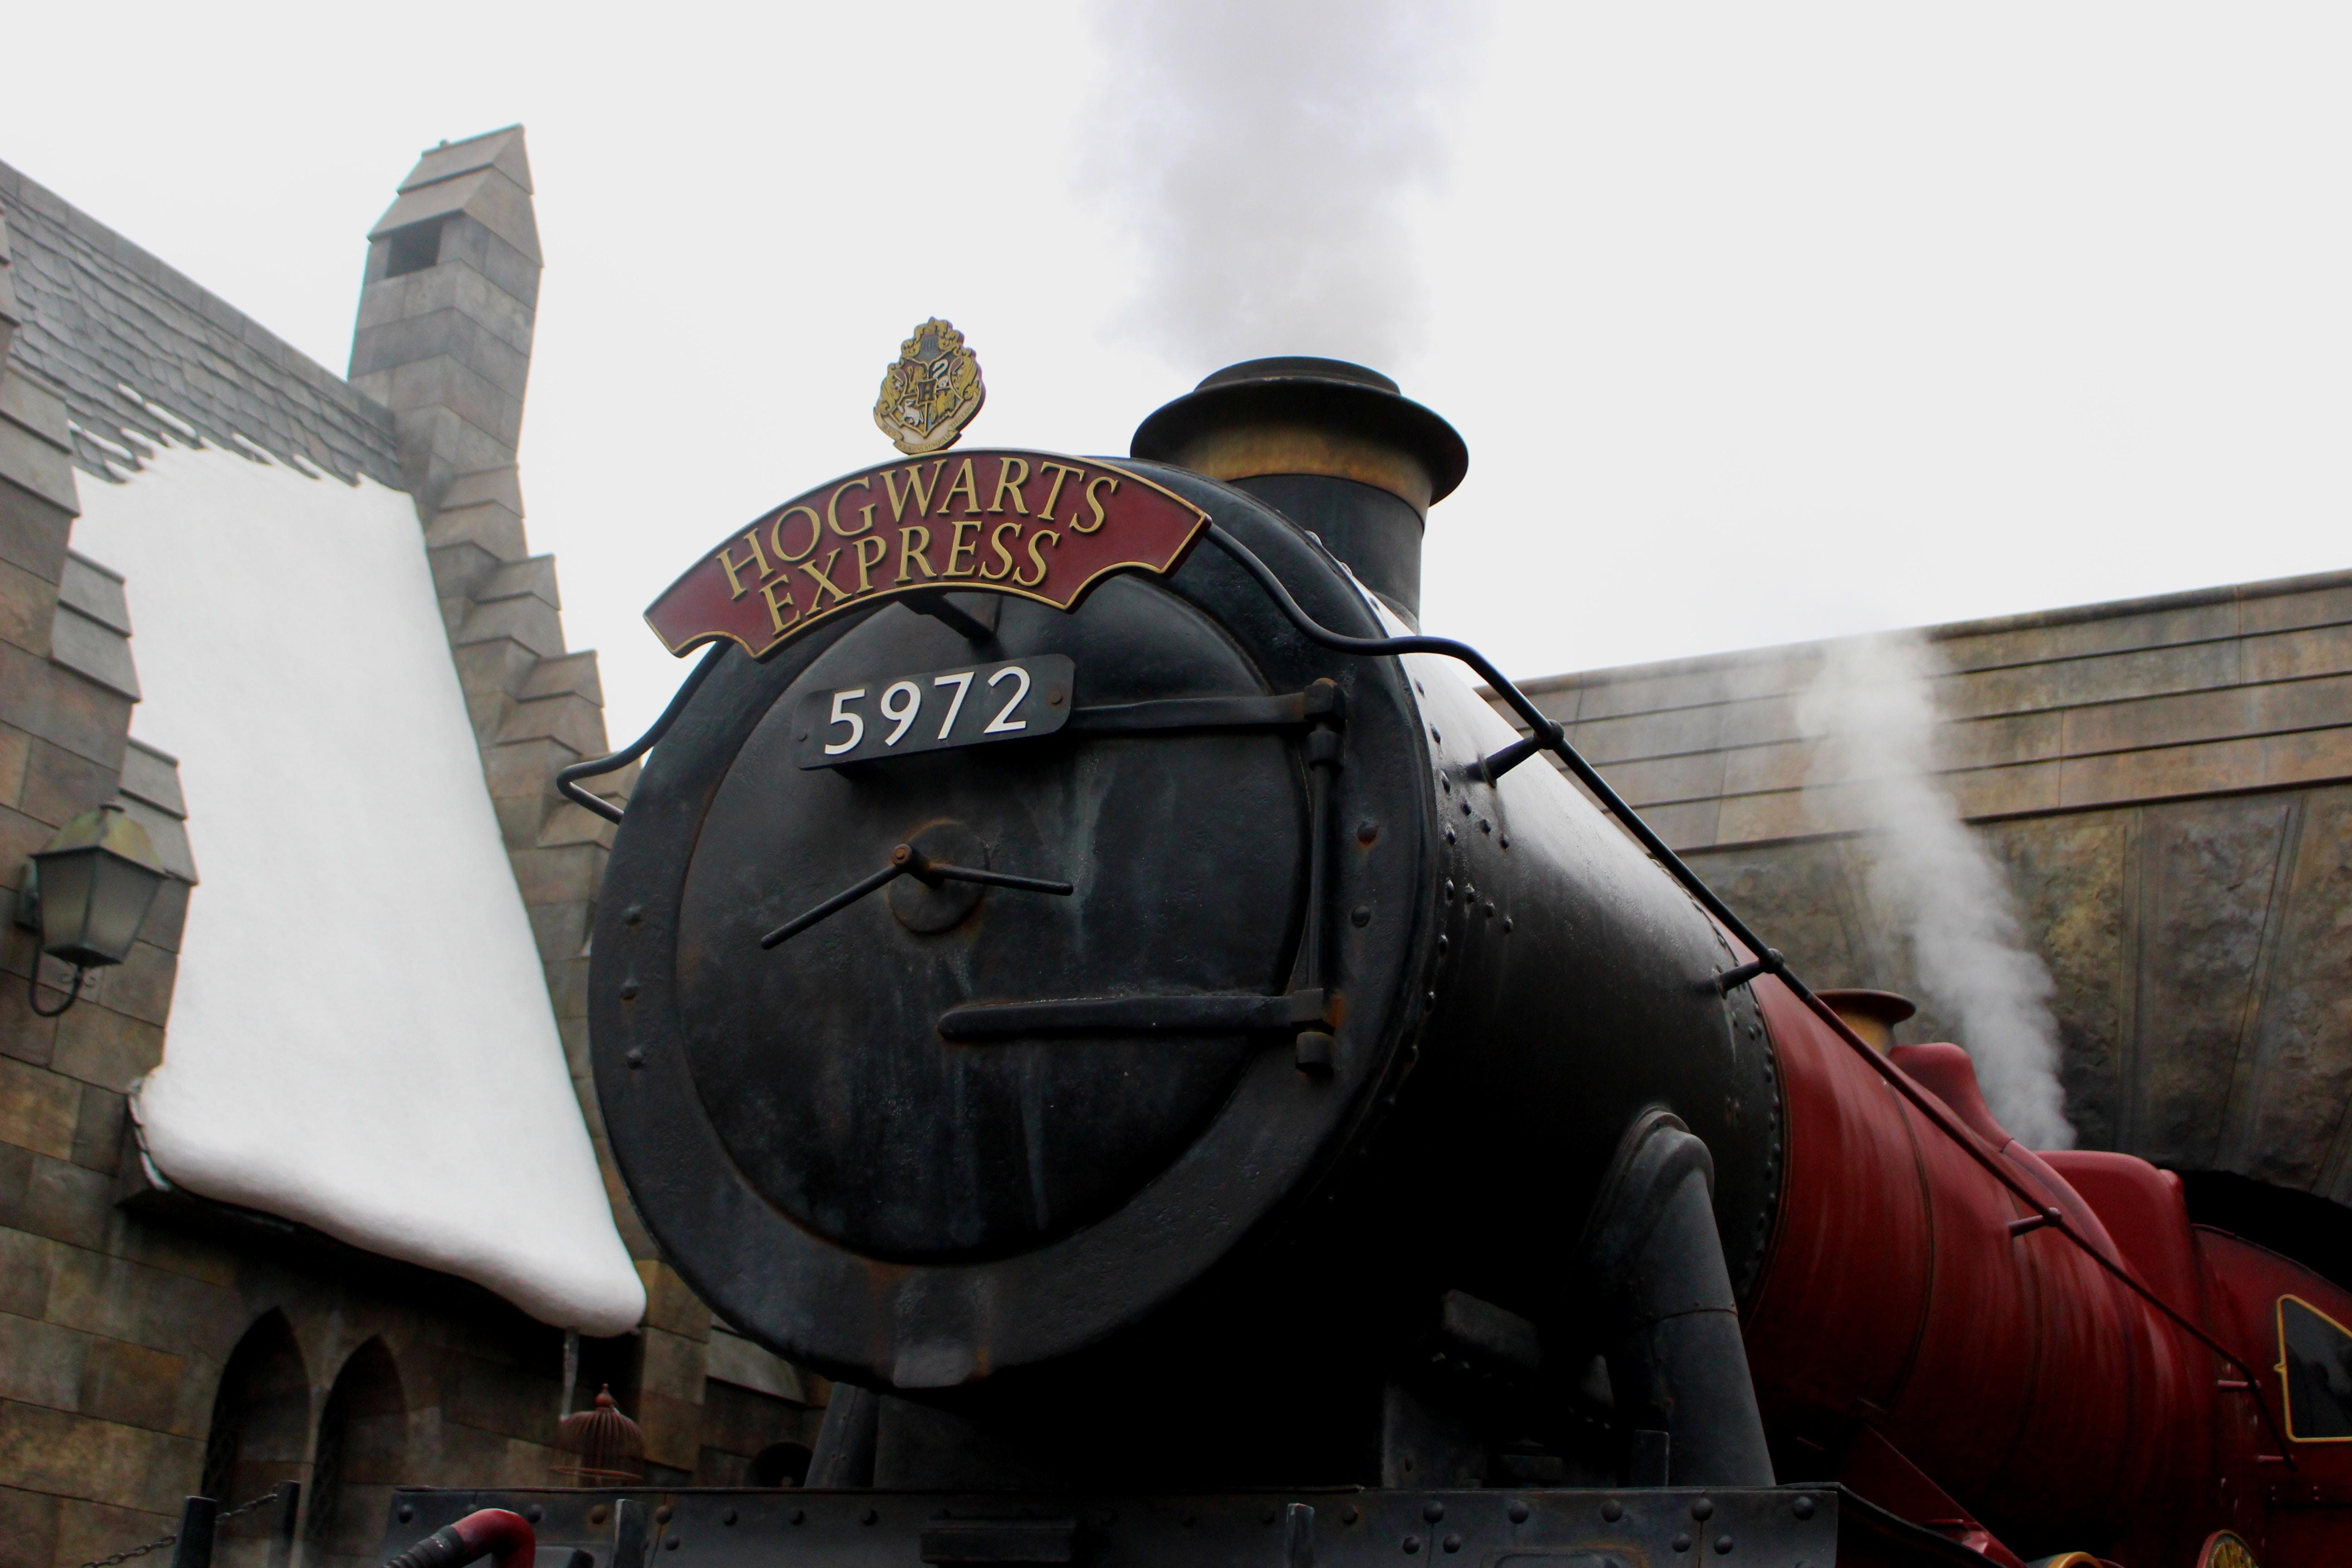 universal studios hogwarts express